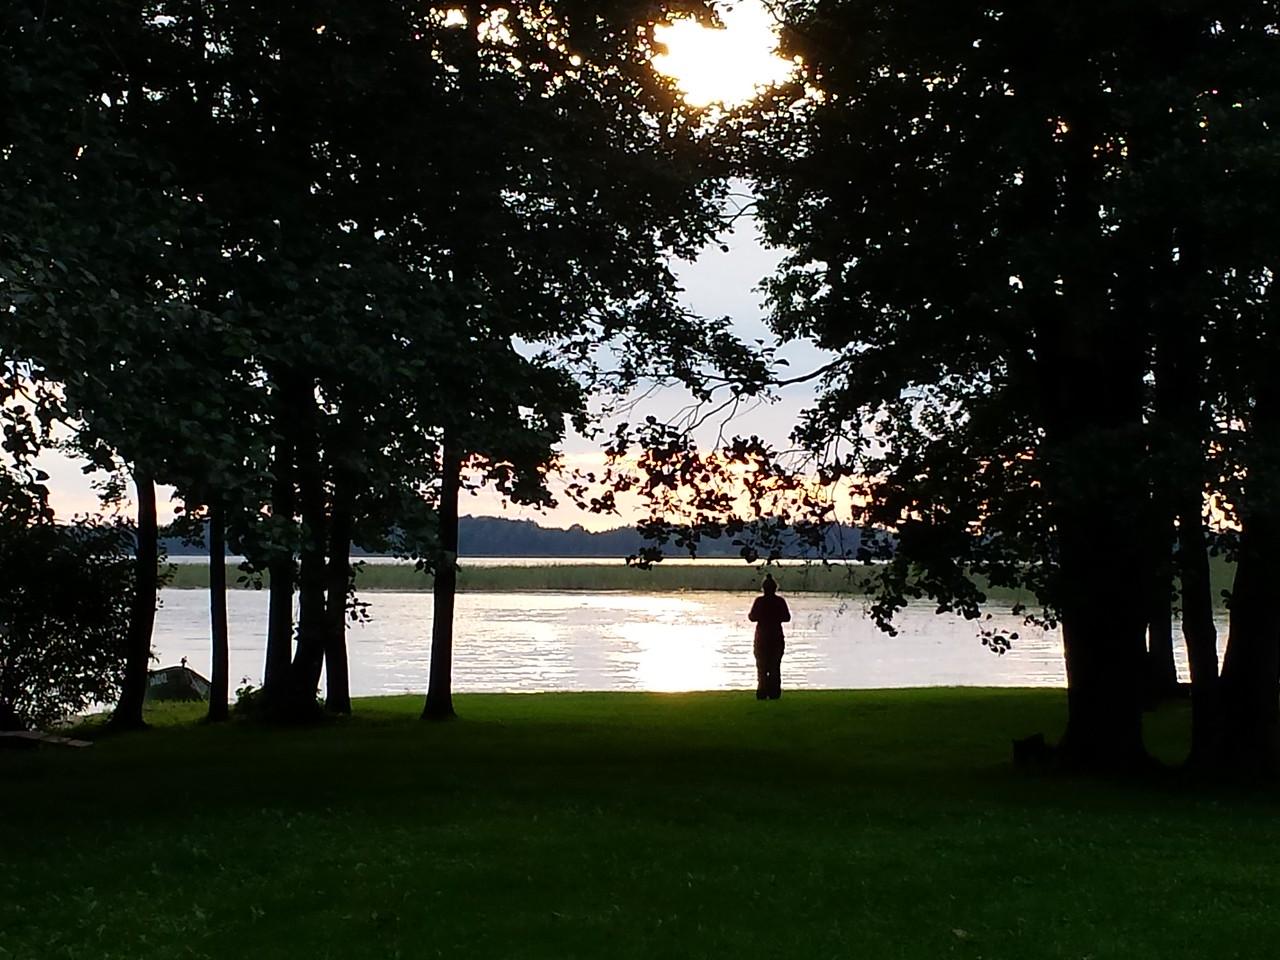 Sofie walking to the lake